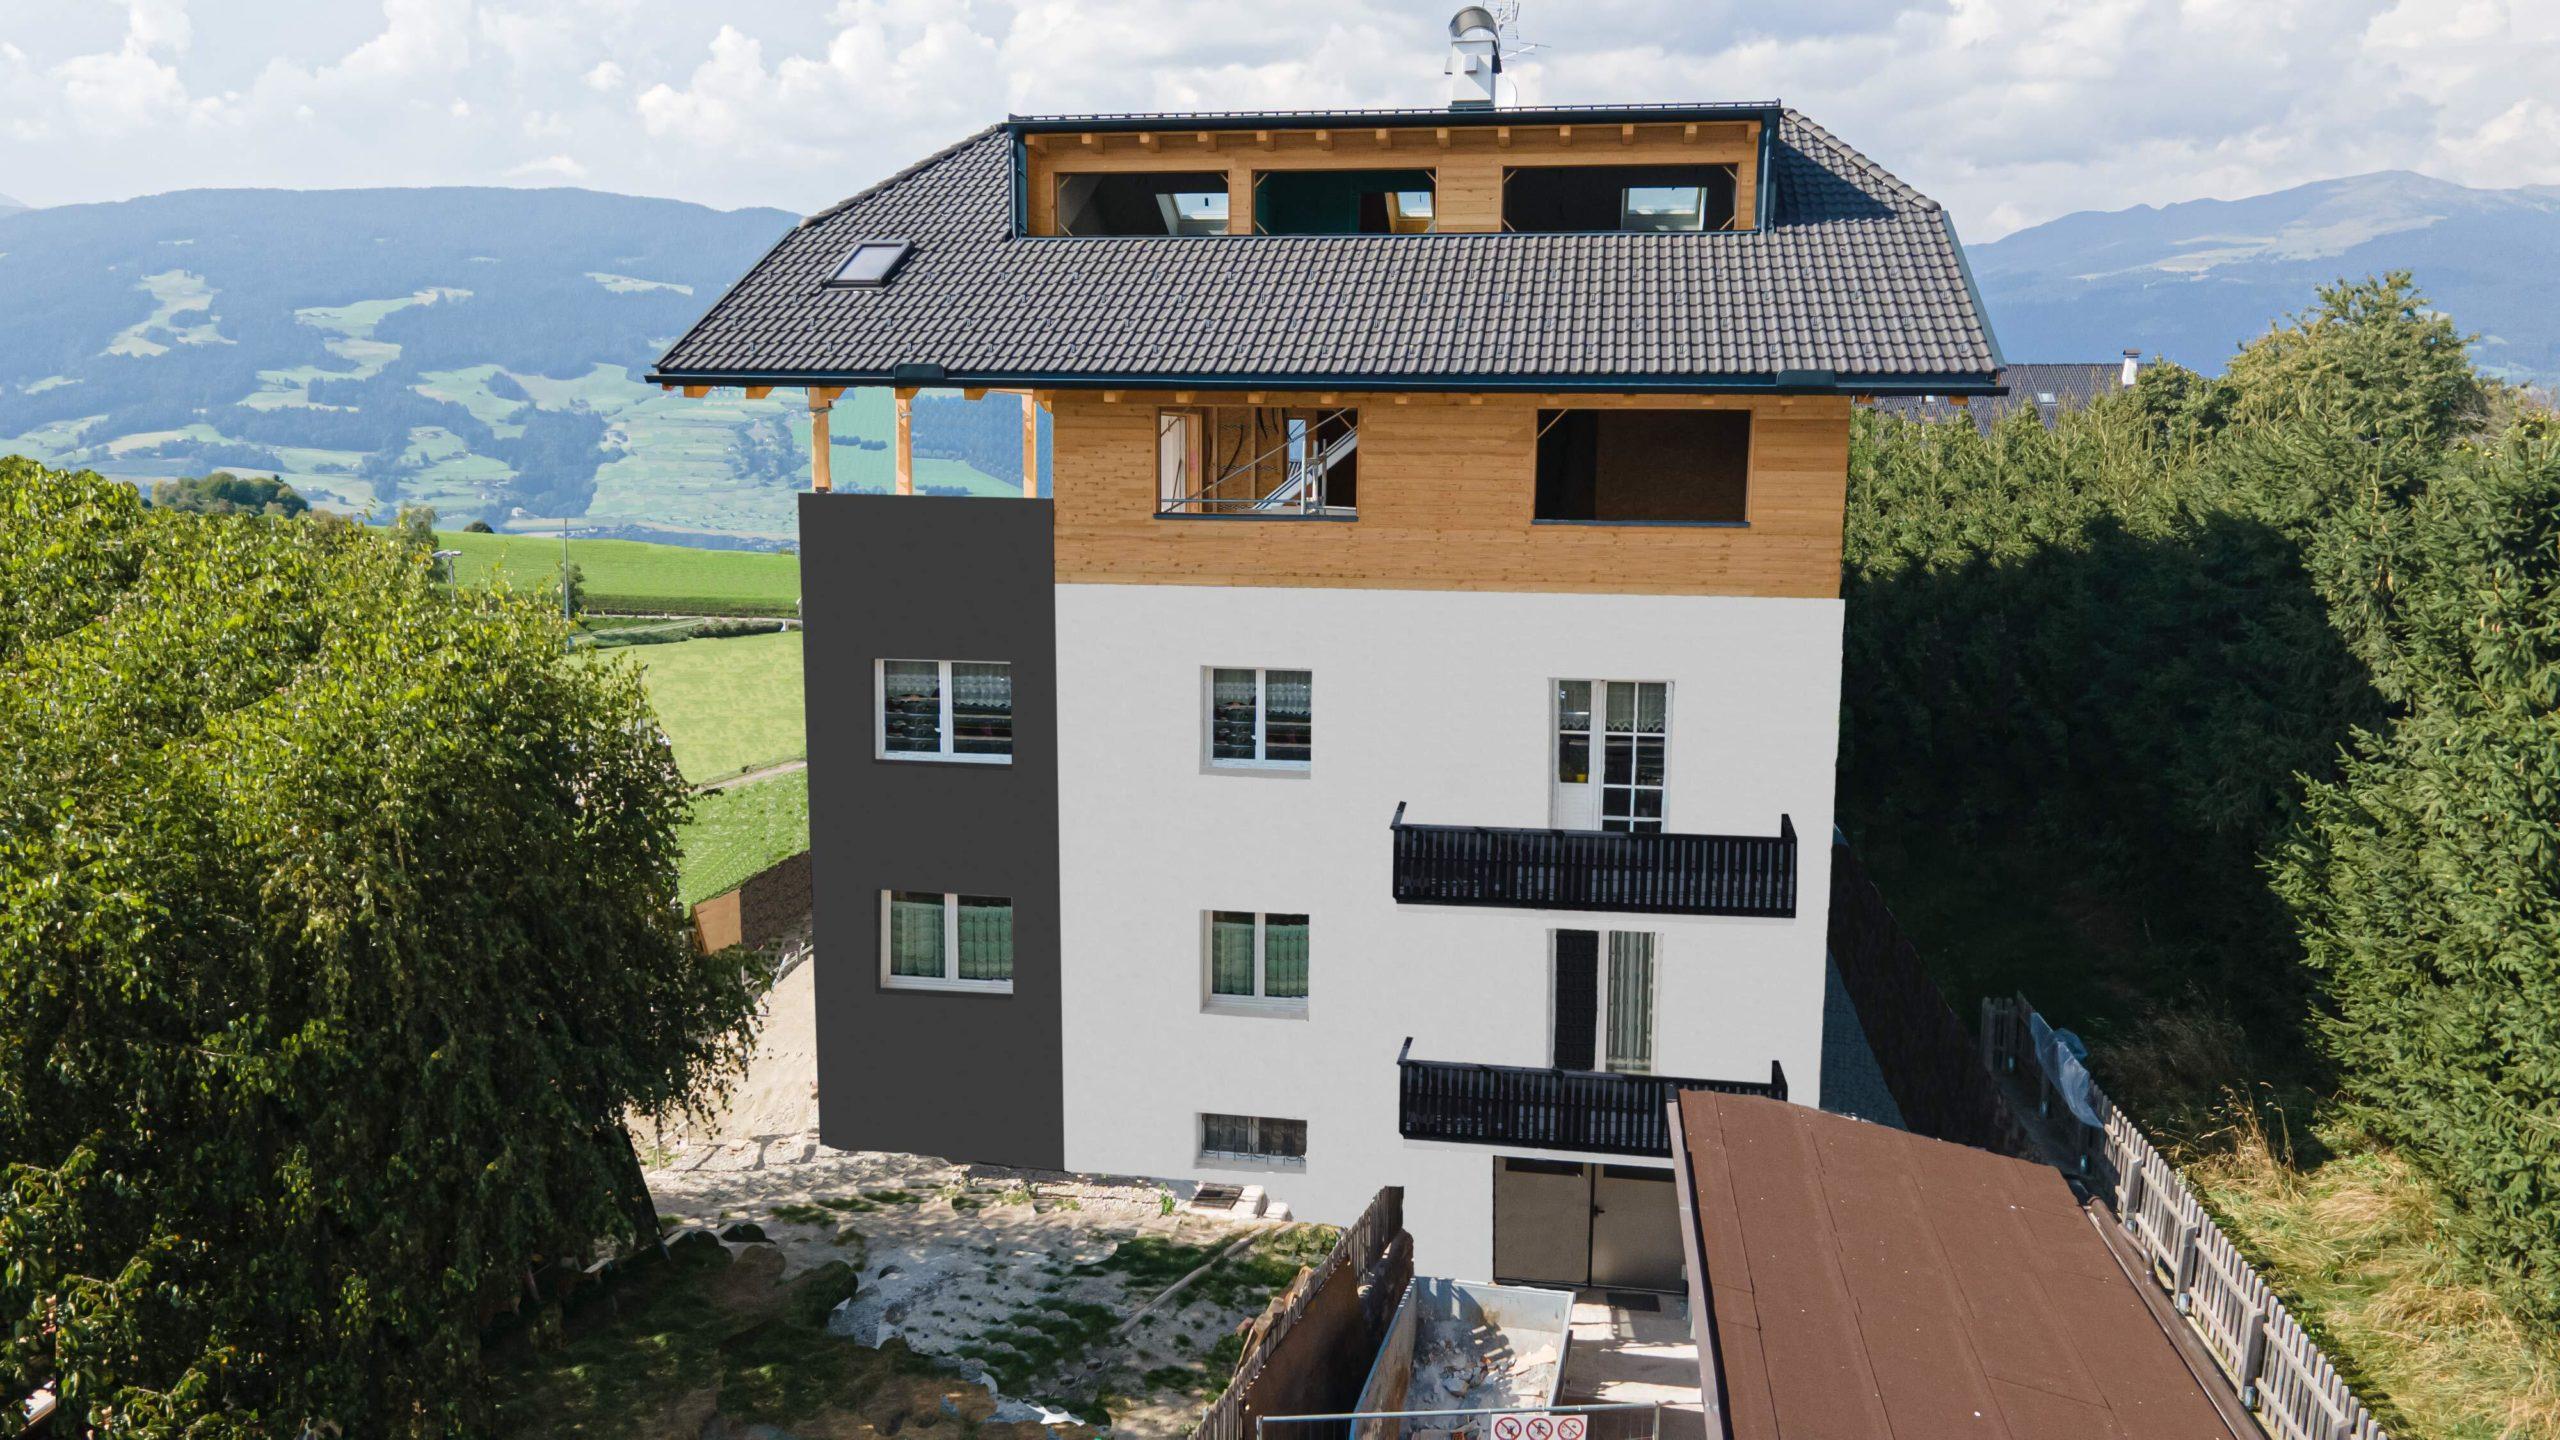 Haus Konzept.8jpg